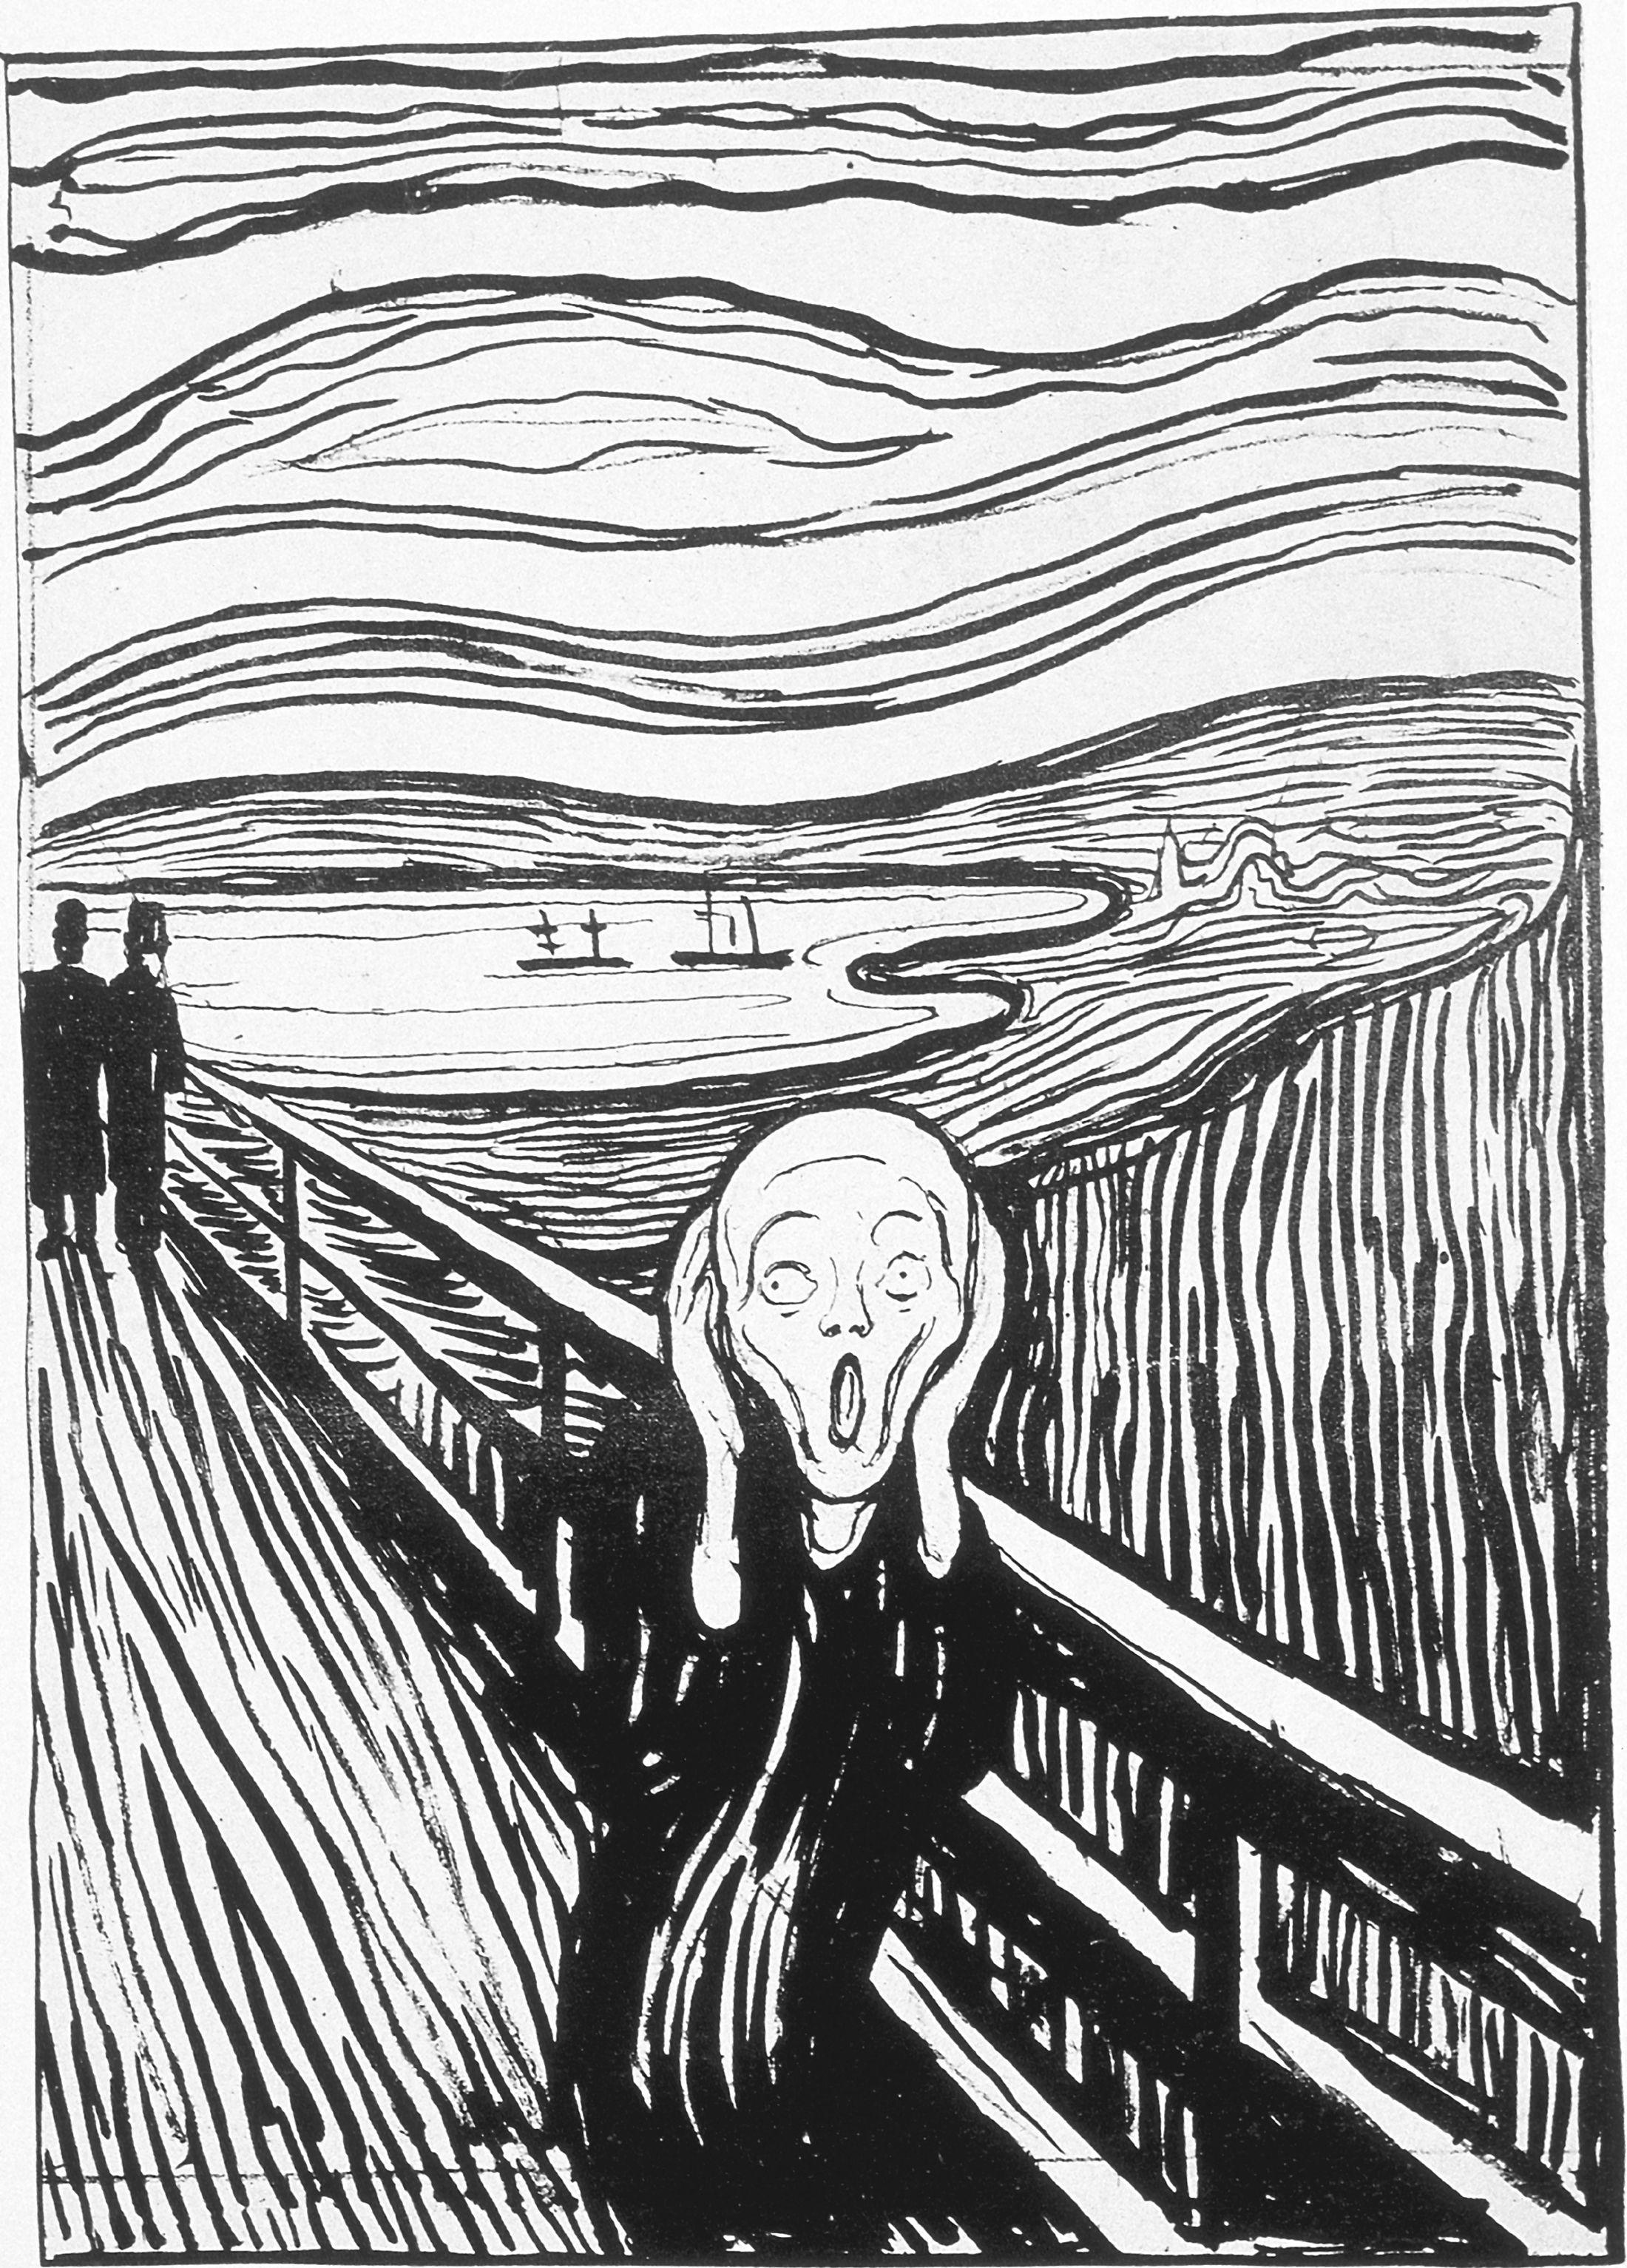 The Scream | Le cri, Le cri munch et Linogravure